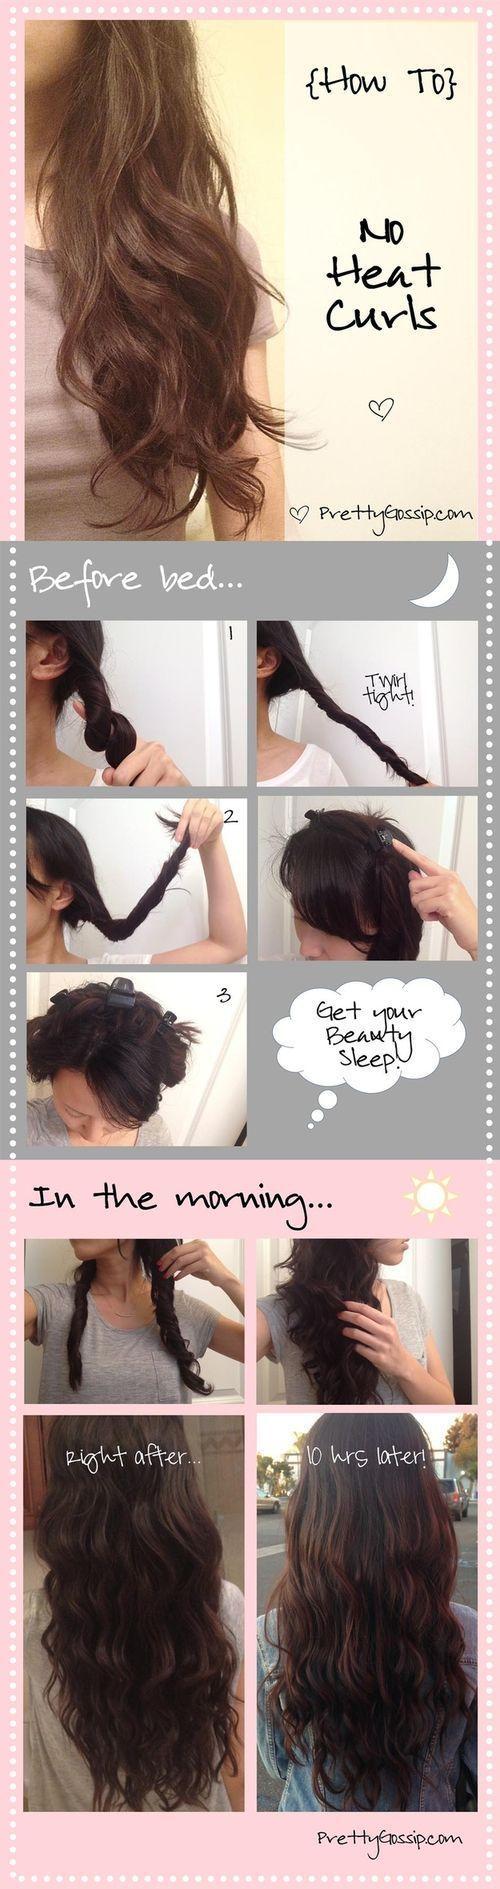 bed curls